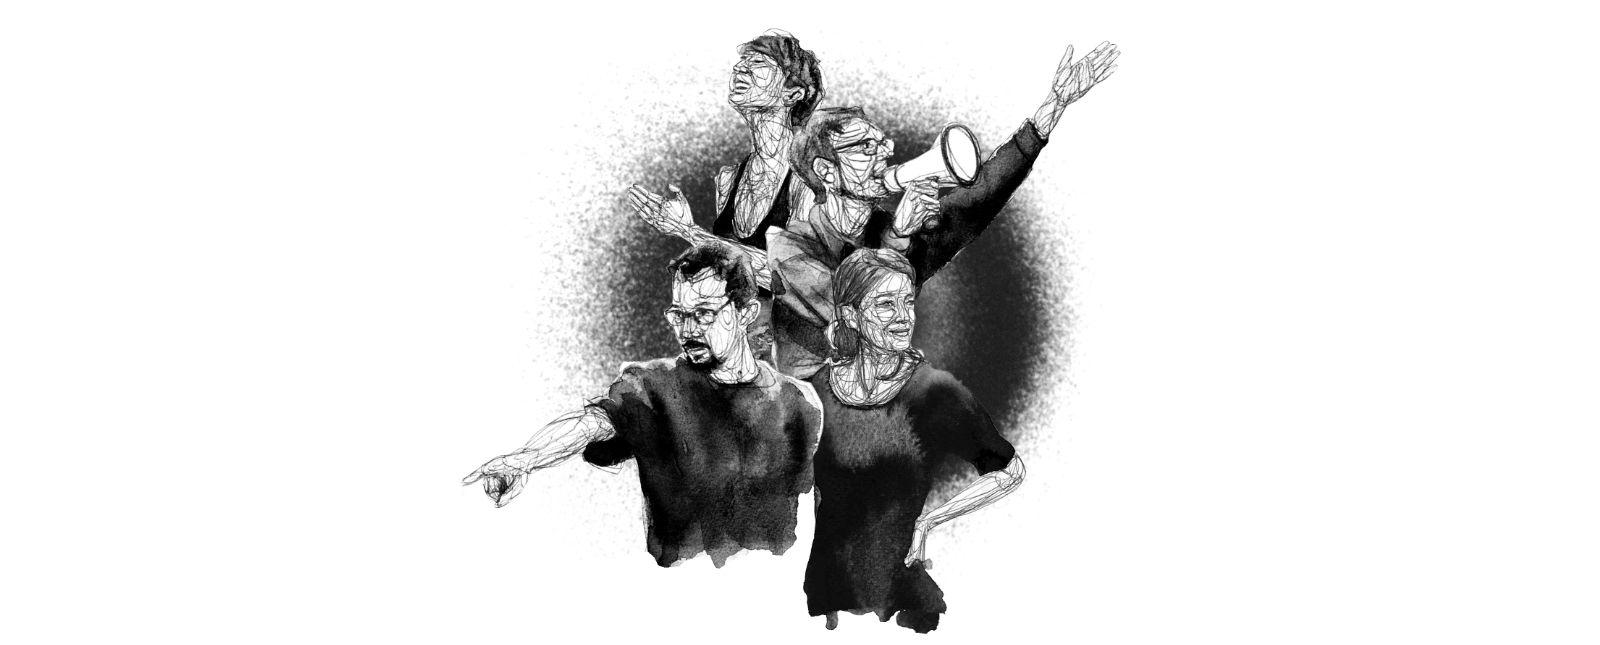 Team Junges Theater // G. Smith // V. Feist // M. Kaiser // A.-L. Schuppe //   2019 // Illustration: Michael Genter